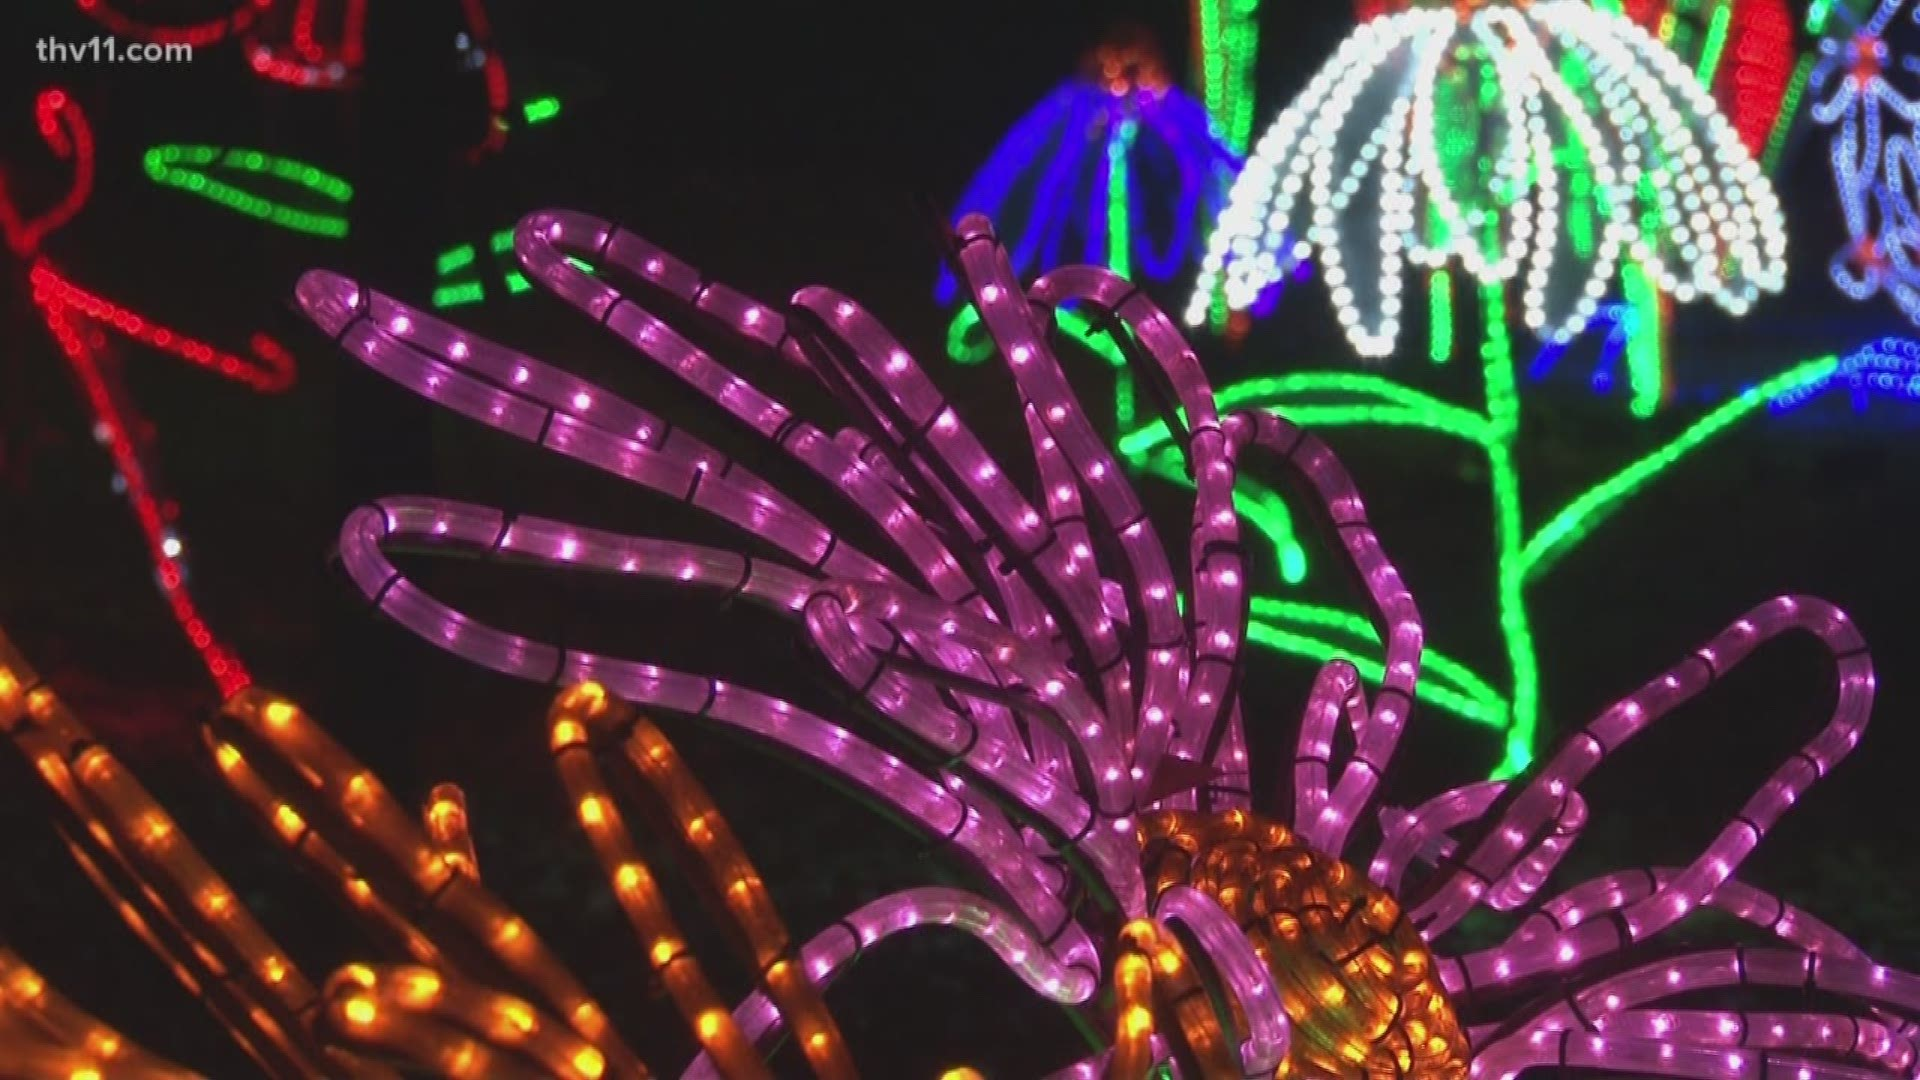 Garvan Gardens Christmas Lights 2021 5 Million Lights On Display At Garvan Gardens Thv11 Com